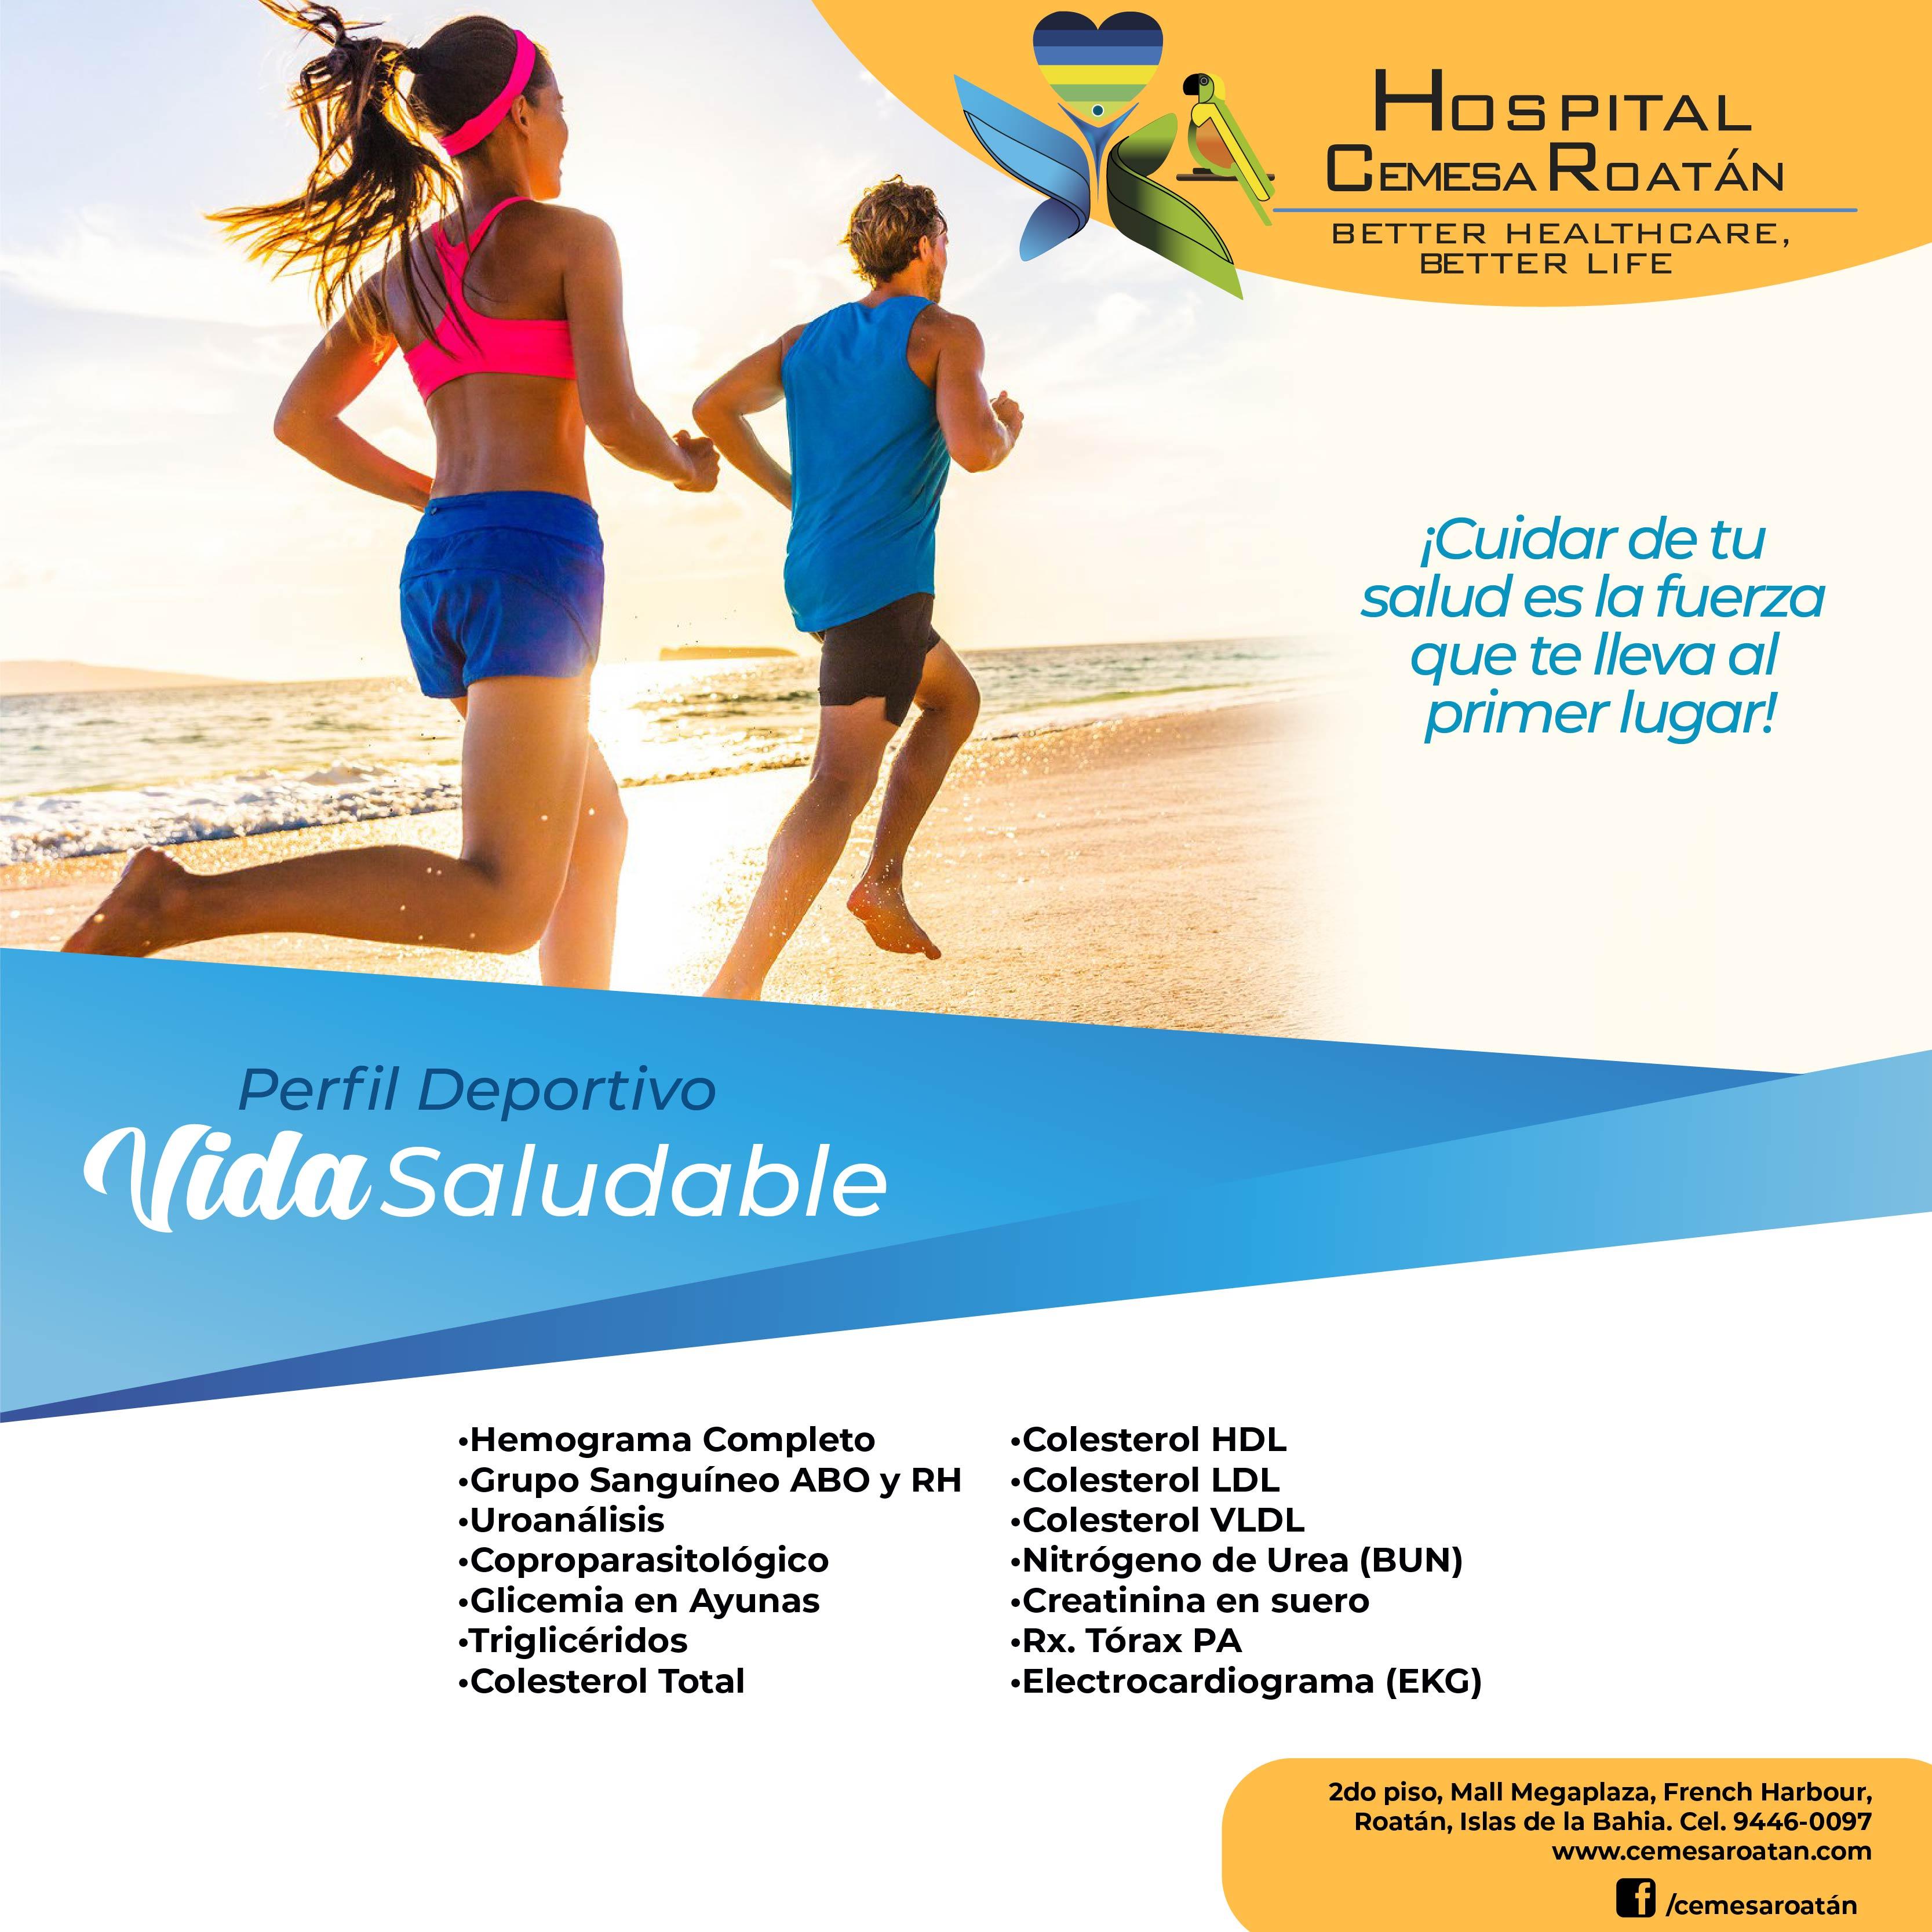 Chequeos Cemesa Roatan-Vida Saludable-11